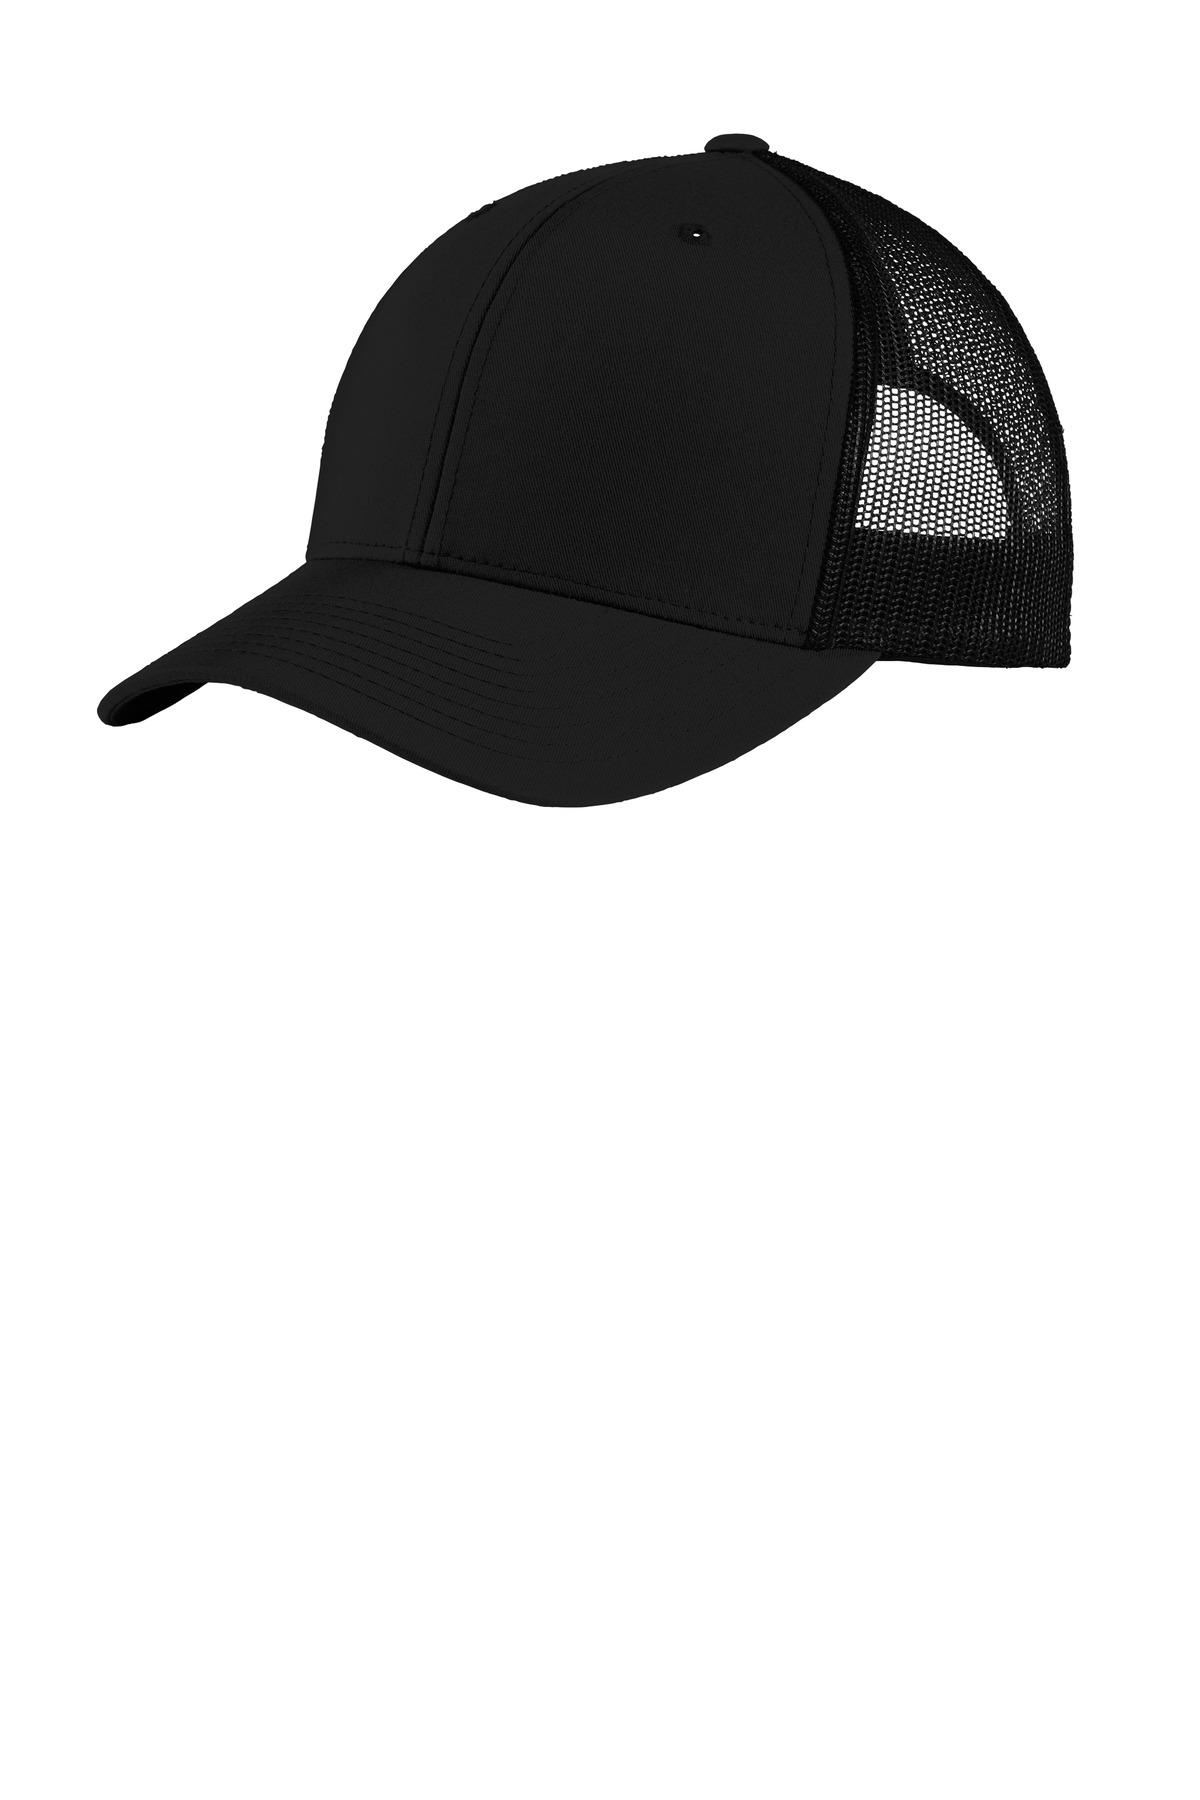 448711ba43d Buy Sport-Tek ® Yupoong ® Retro Trucker Cap. - Sport-Tek Online at ...